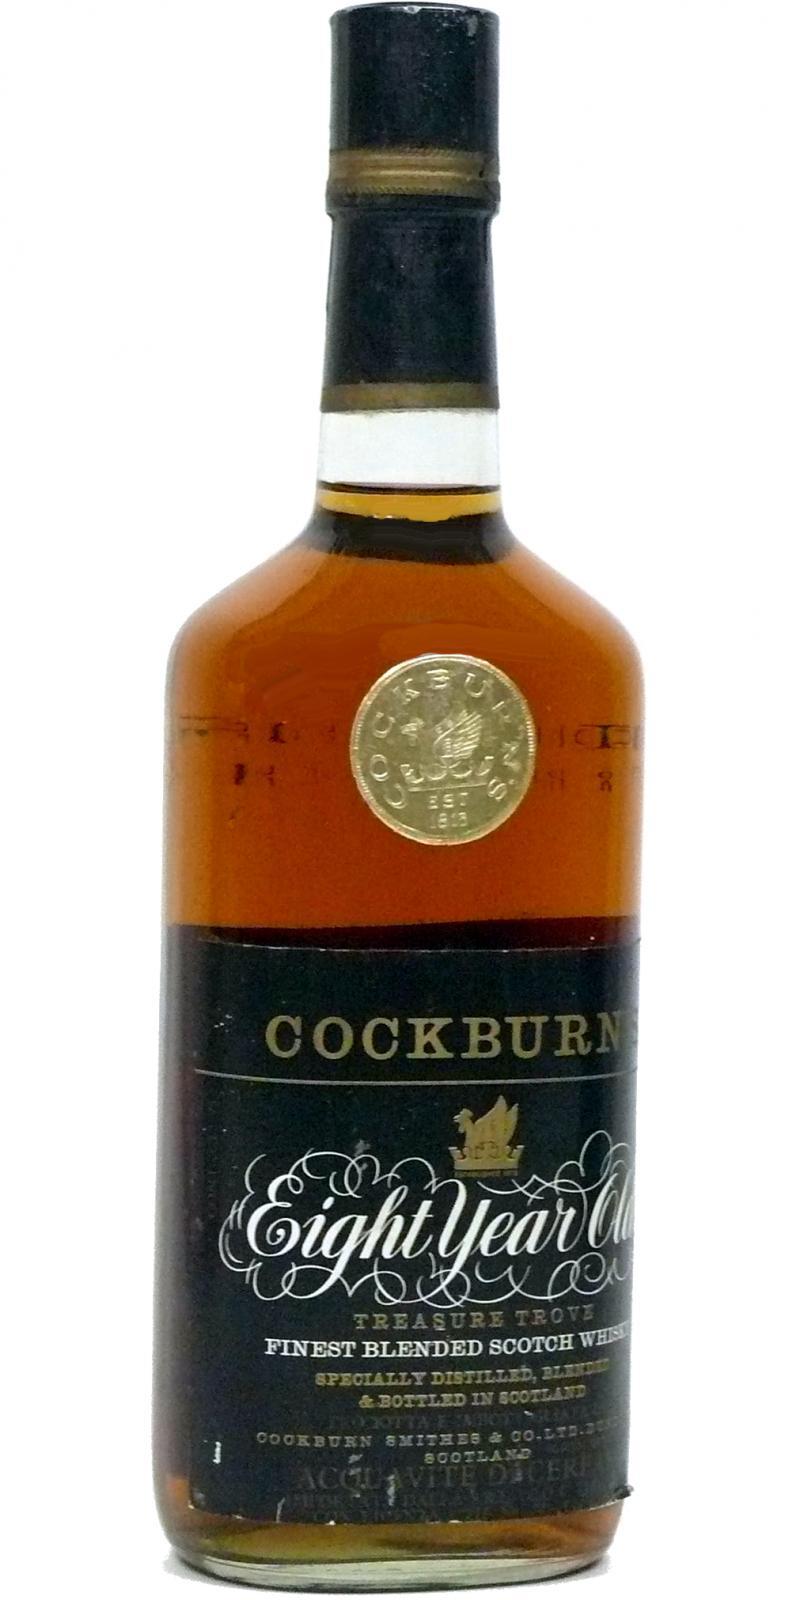 Cockburn's 08-year-old